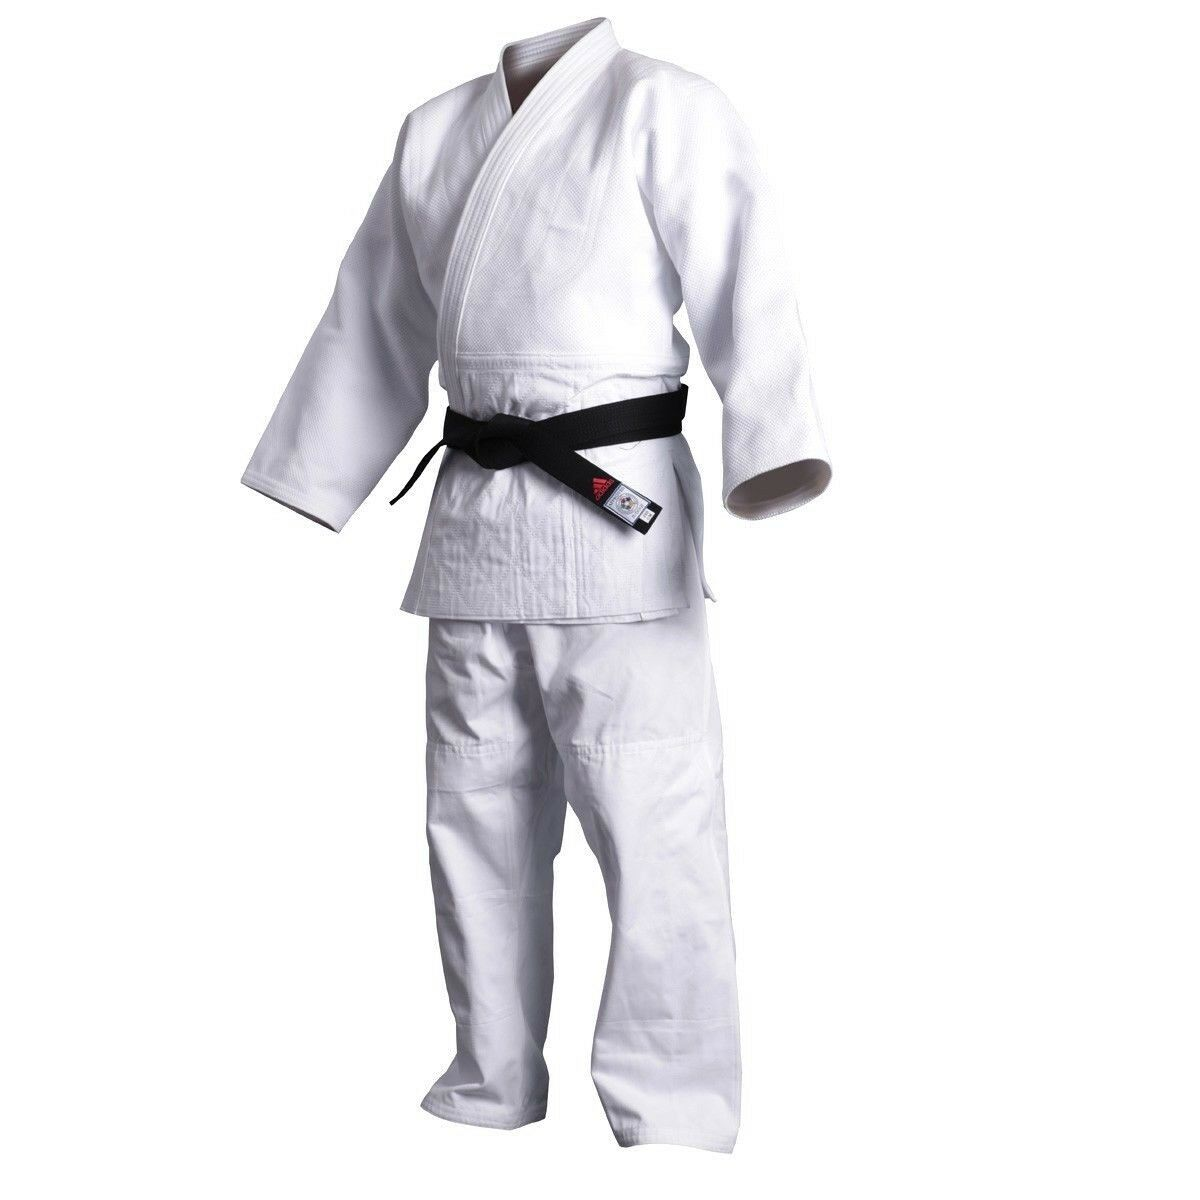 New adidas Judo Training White Gi Uniform Single Weave 100% Cotton-J500